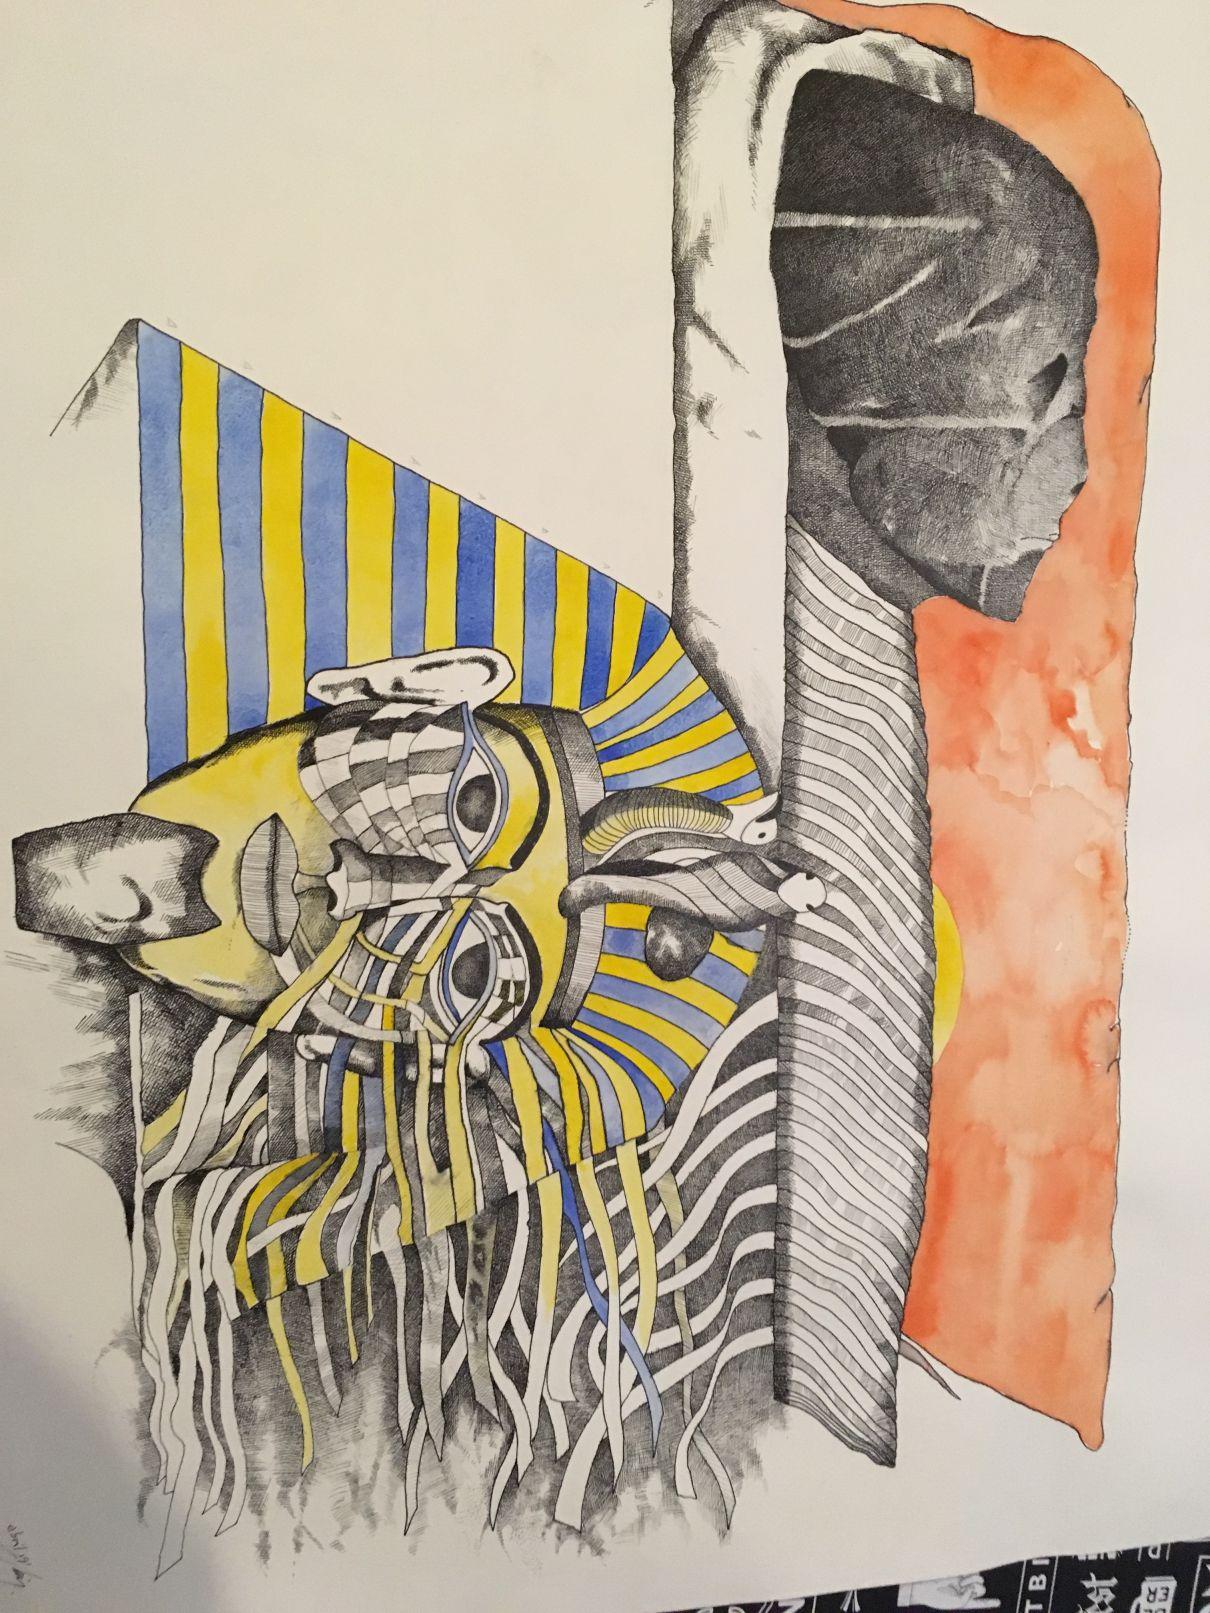 Tut anj Amun (2019) - Christian Adel Mirza Perpignani